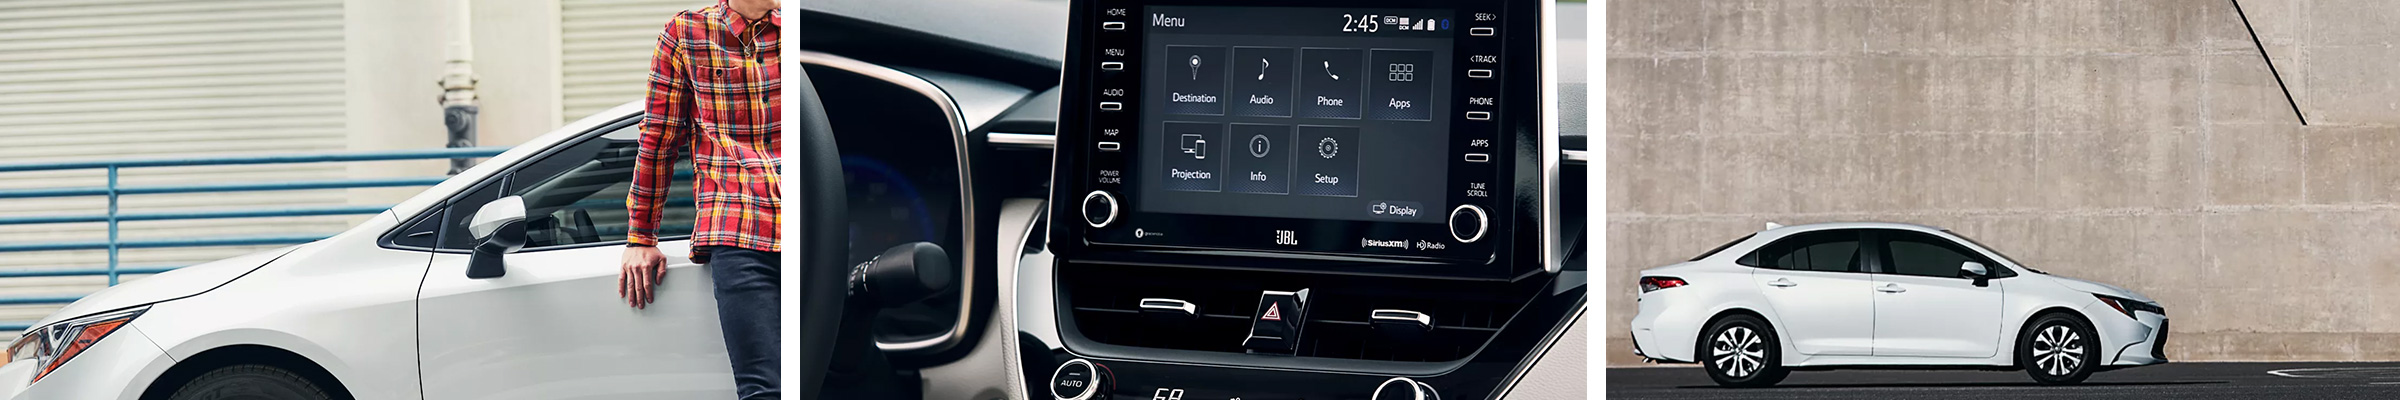 2022 Toyota Corolla Hybrid For Sale Savannah GA   Chatham County